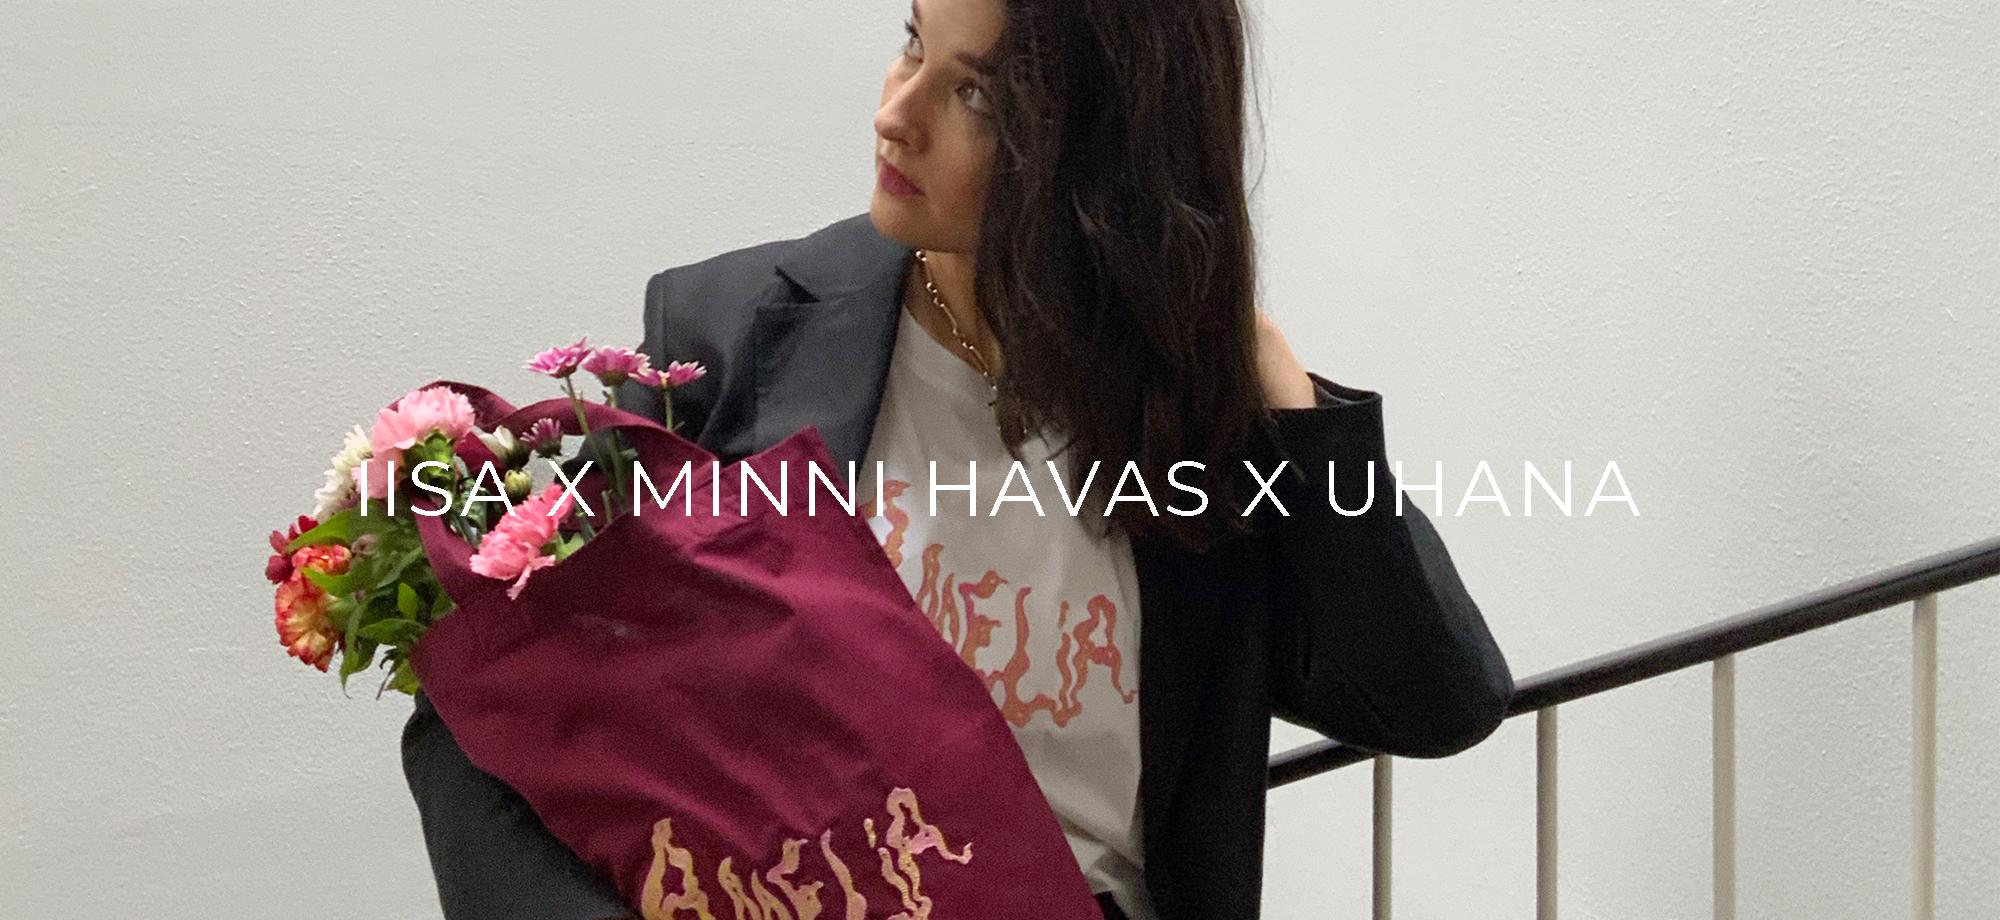 IISA X MINNI HAVAS X UHANA: Amelia-minimallisto